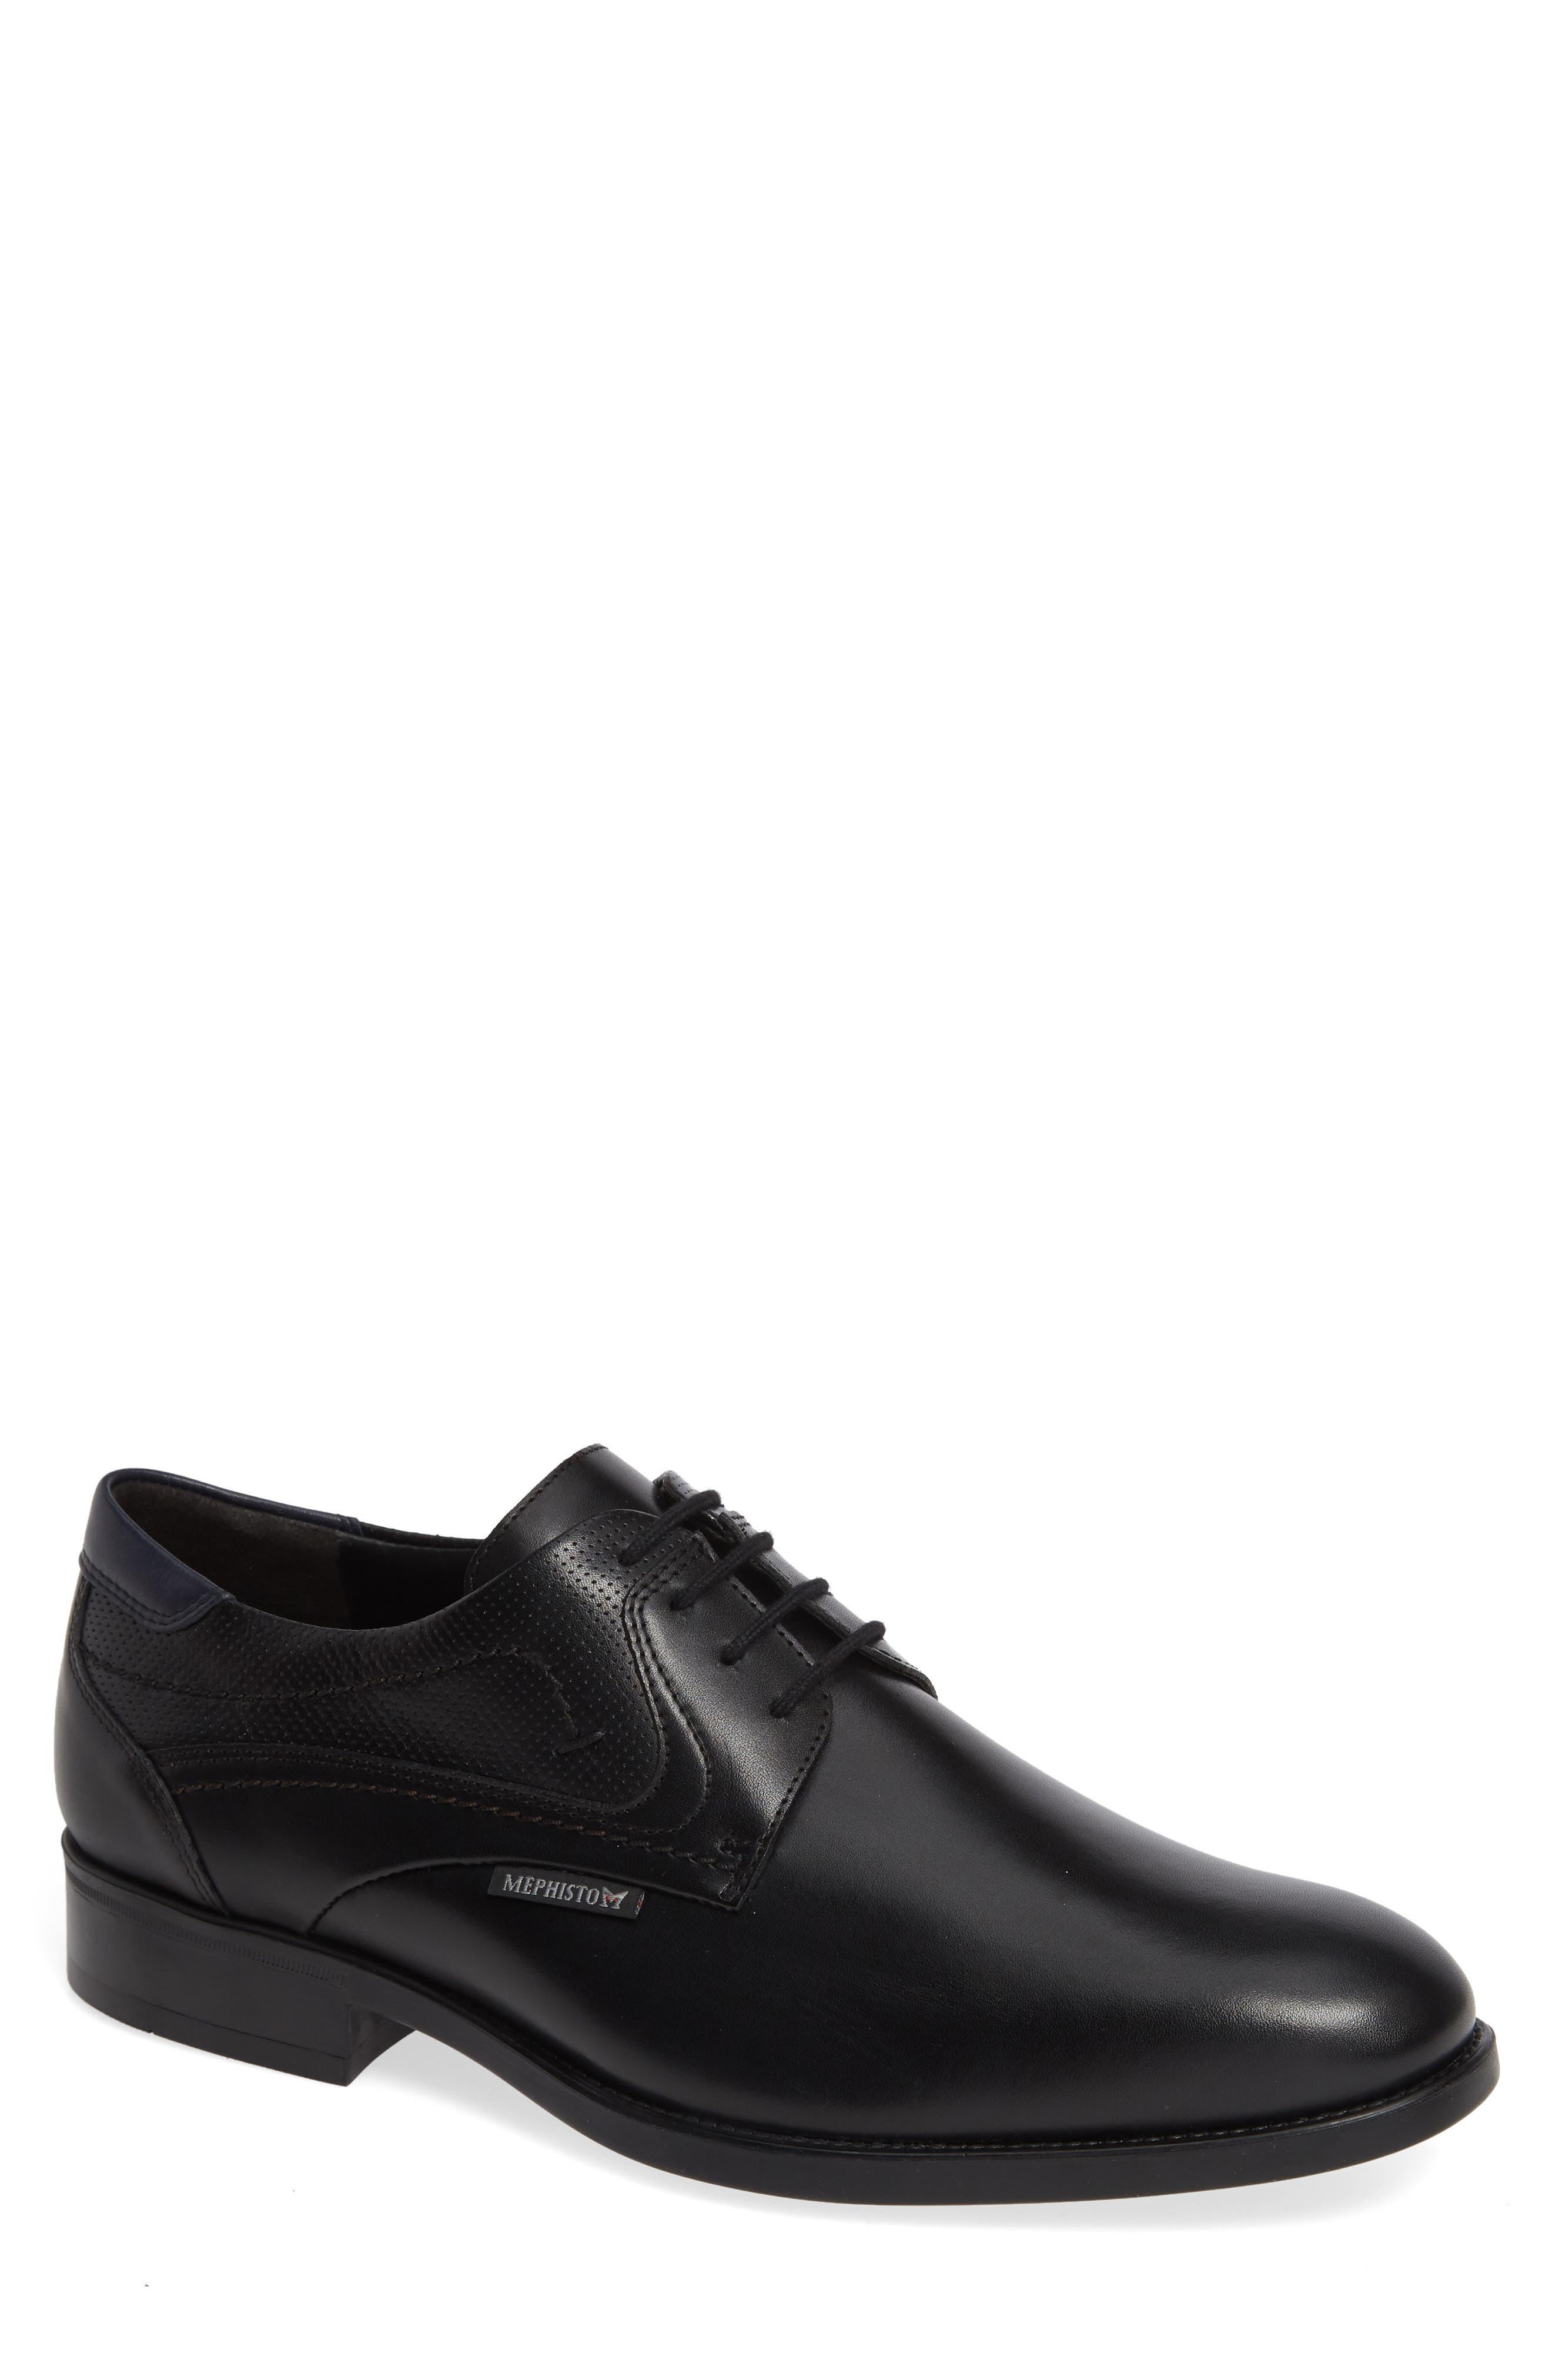 MEPHISTO Cirus Plain Toe Derby, Main, color, BLACK/ NAVY LEATHER